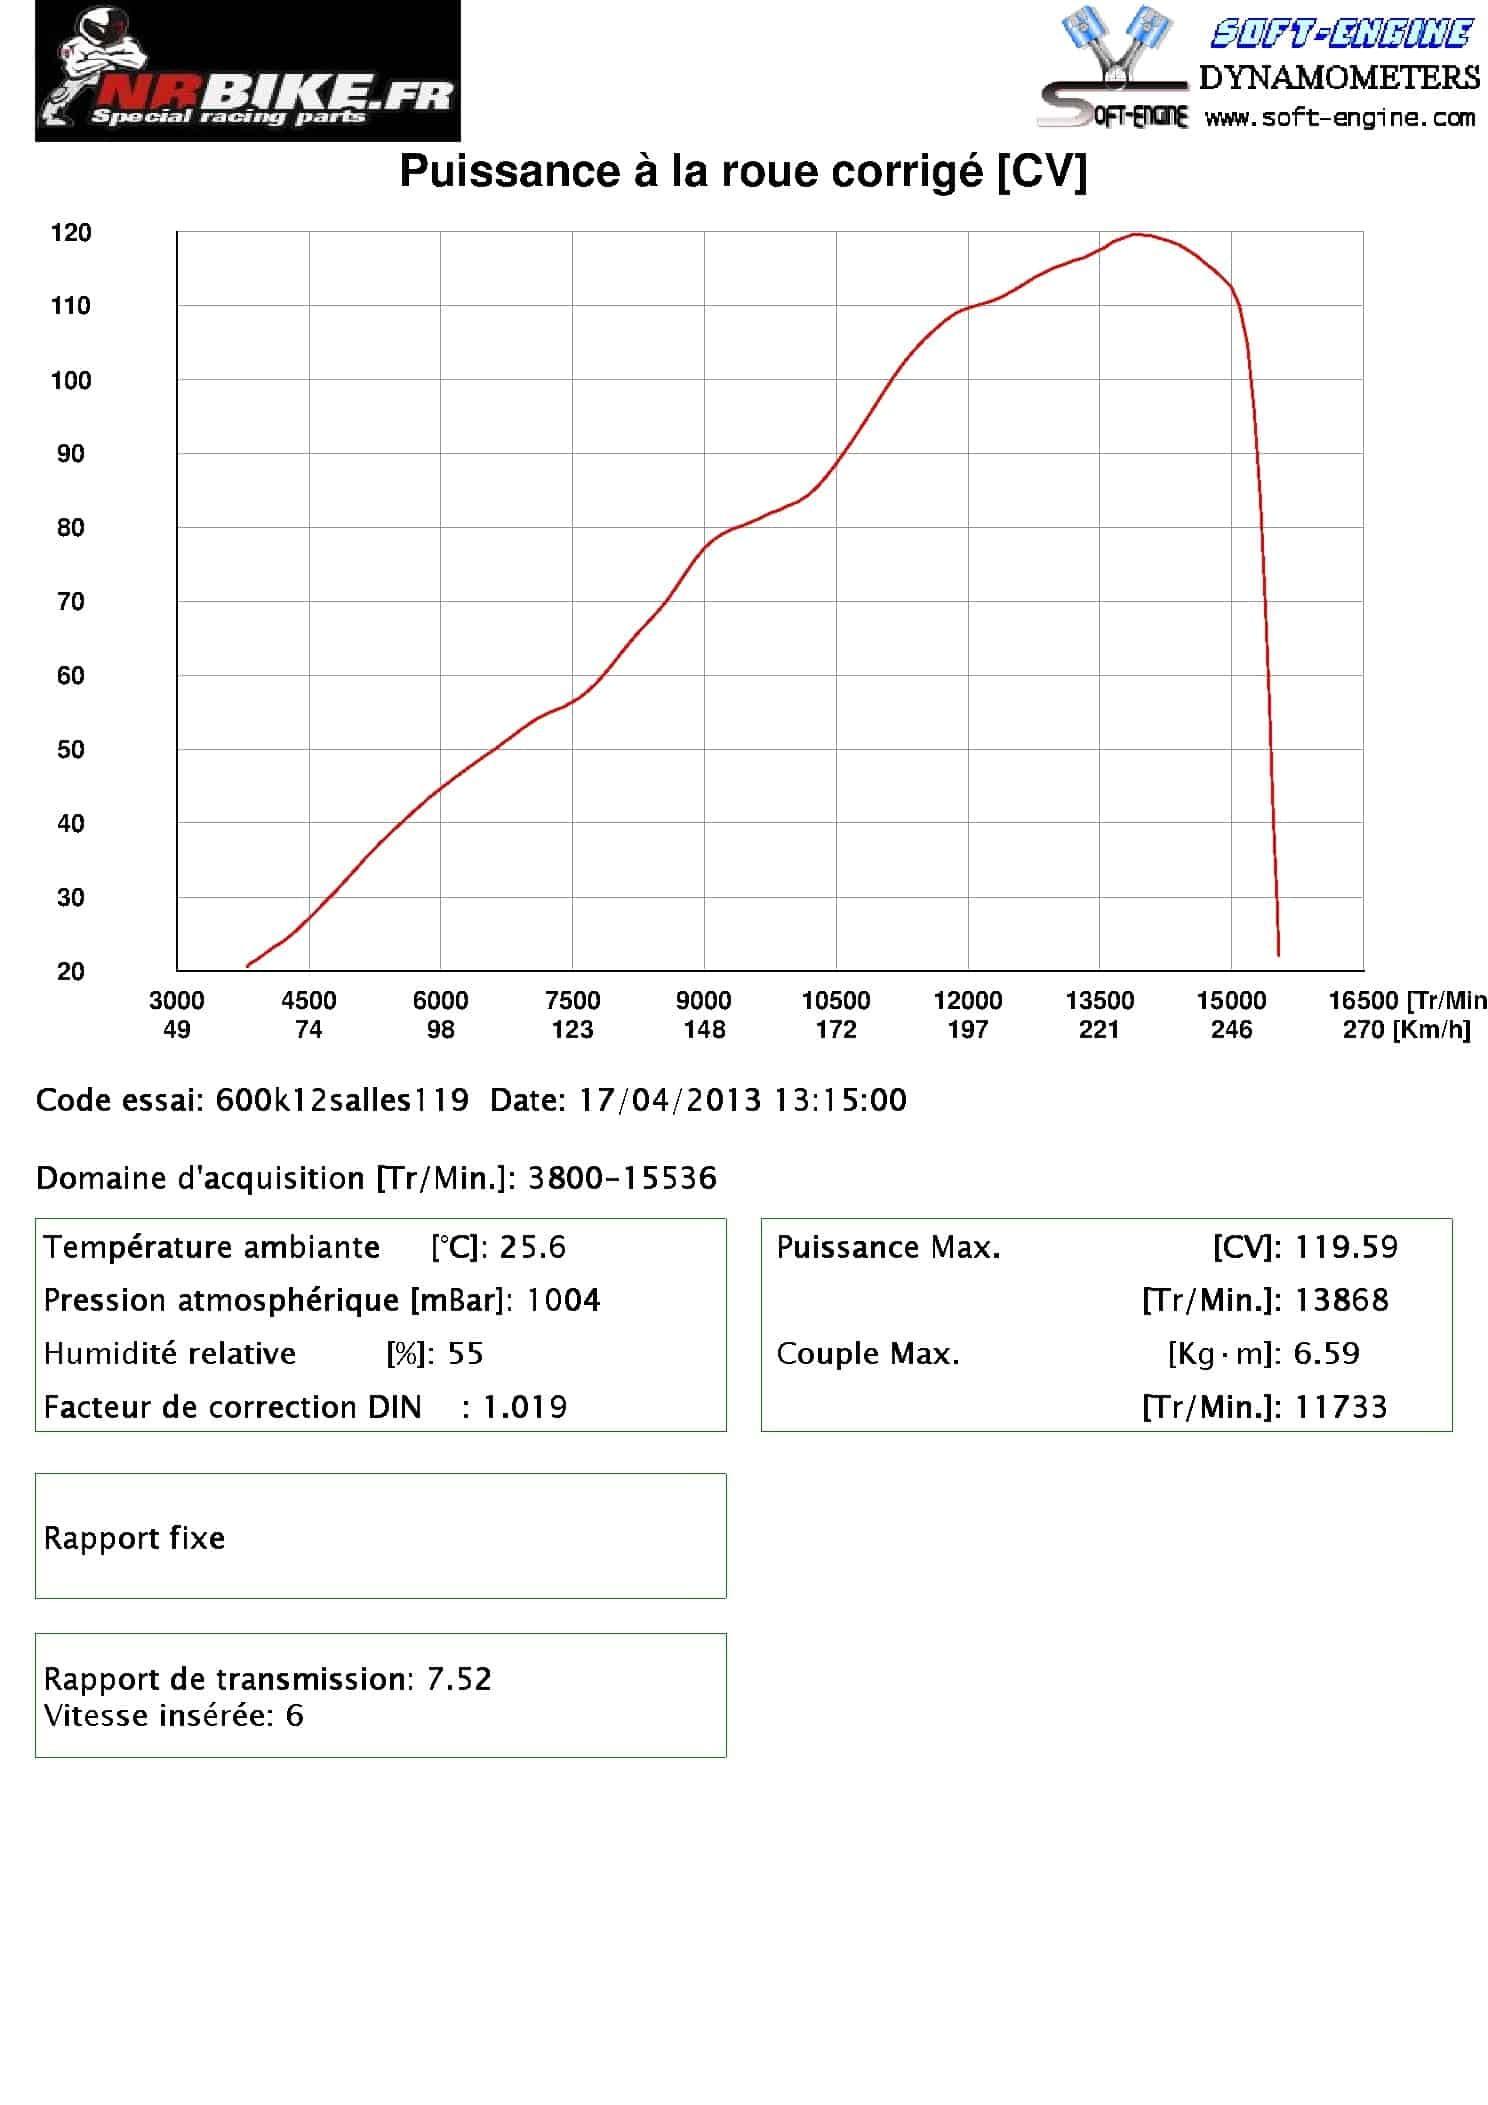 Reprogrammation 600 L2